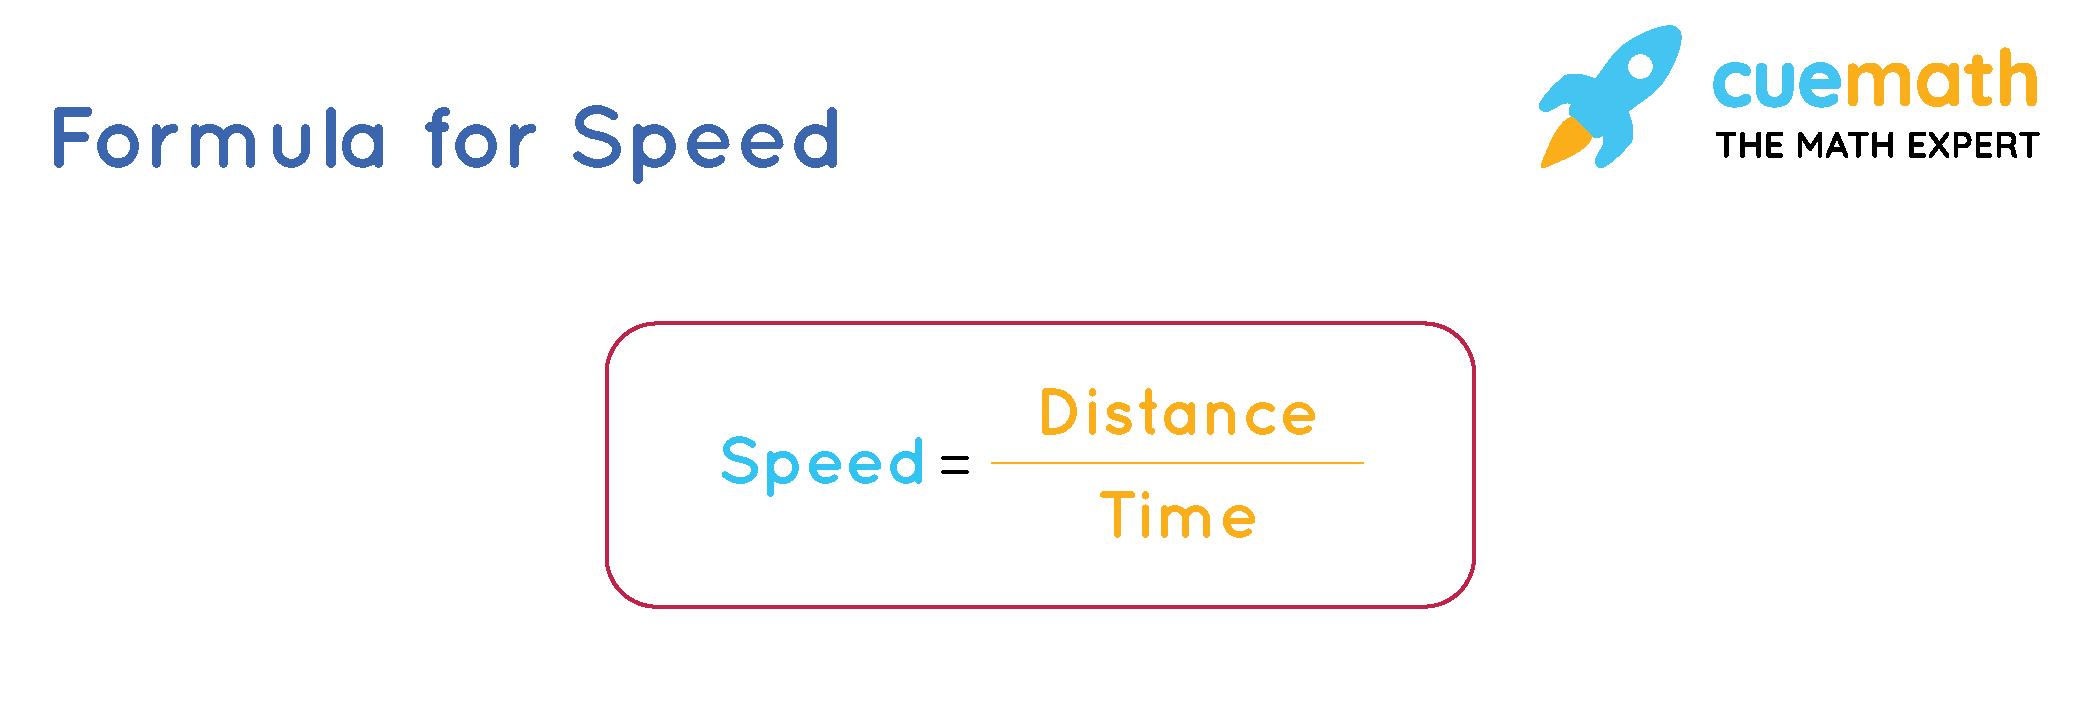 The speed formula